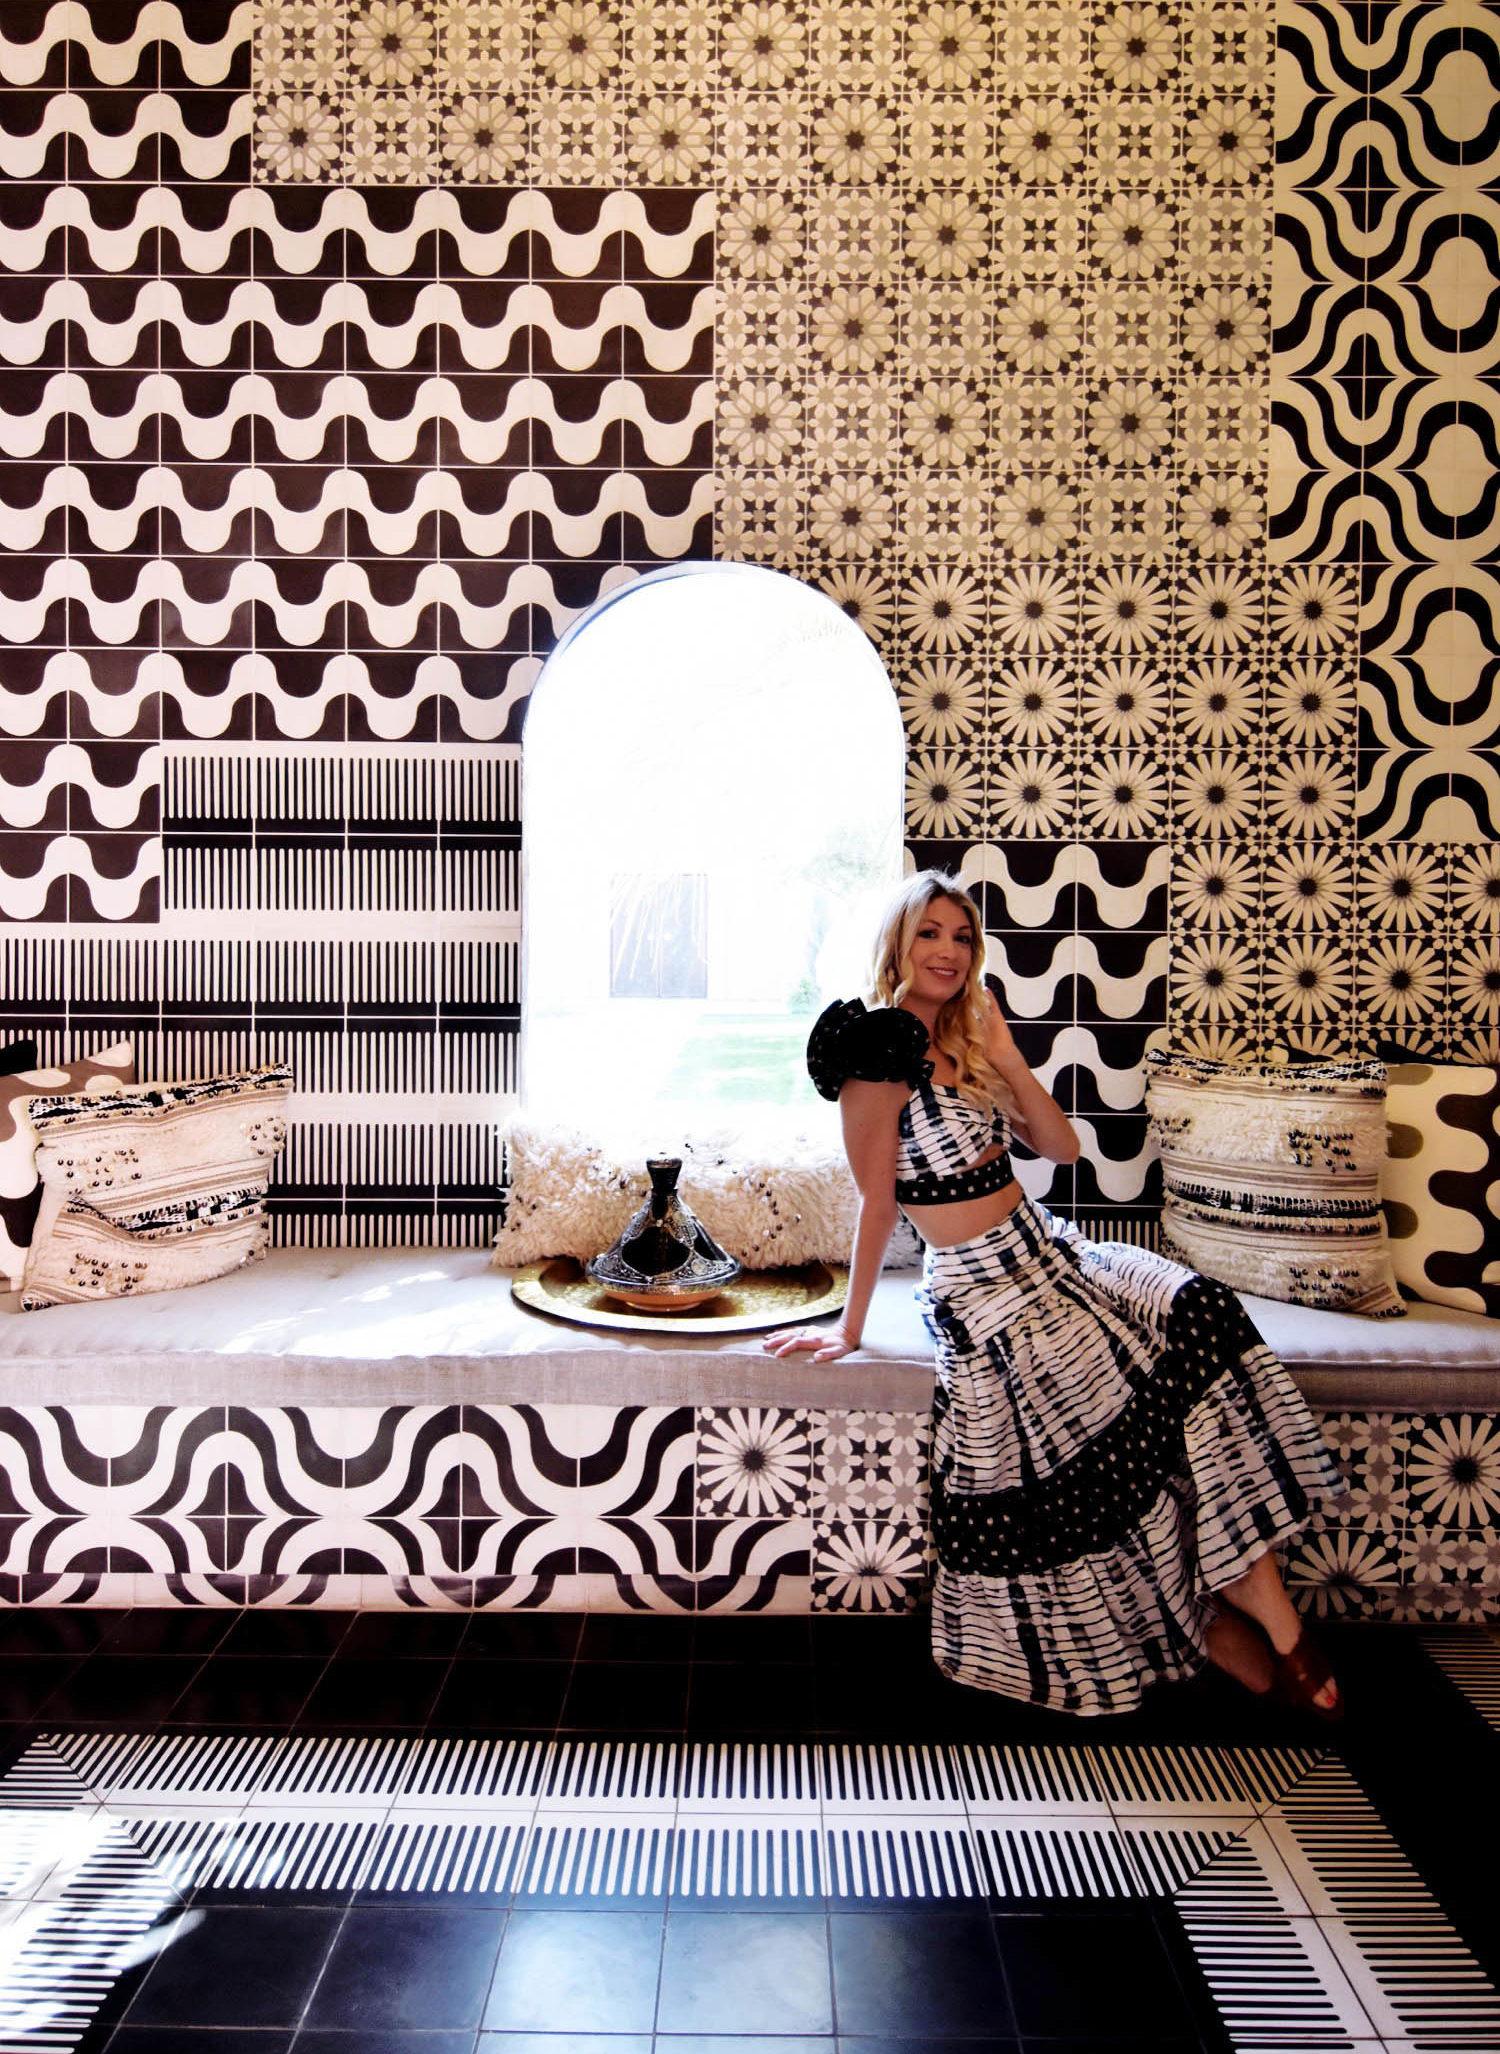 Stefanie Schoen in her own design. Photo:  The Style Safari